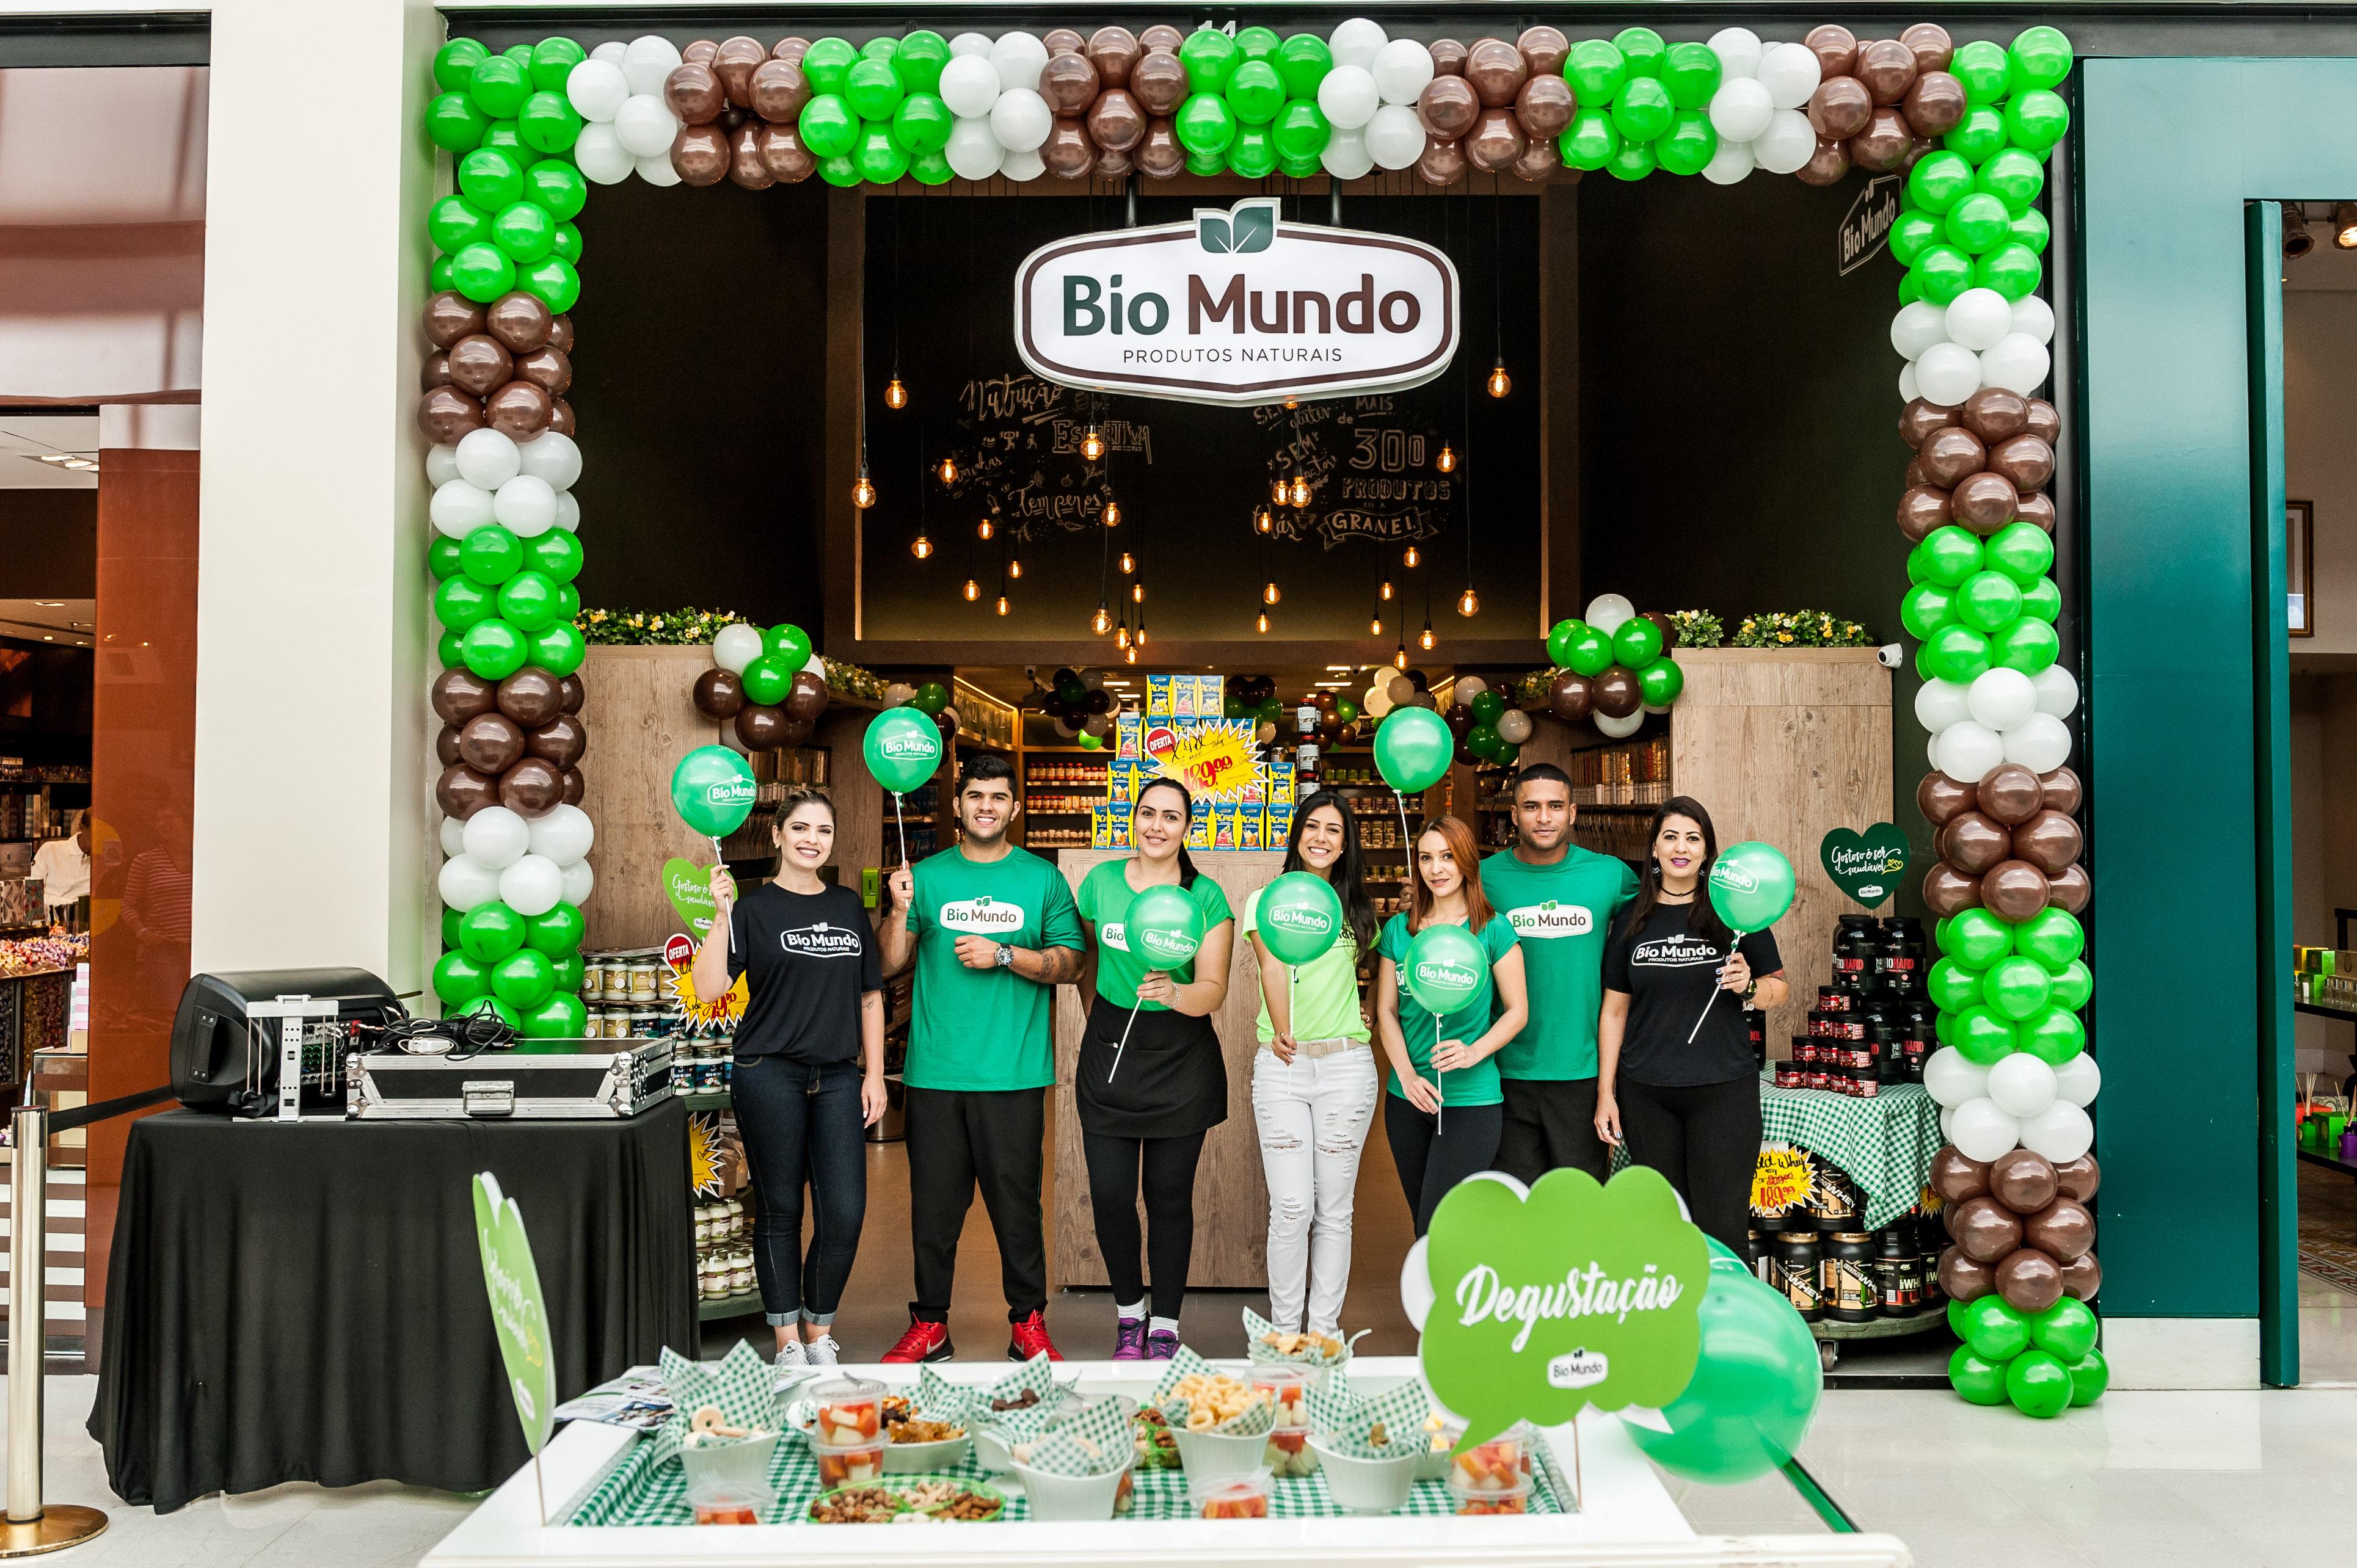 Iauguração BioMundo Iguatemi 22.07.2017-19